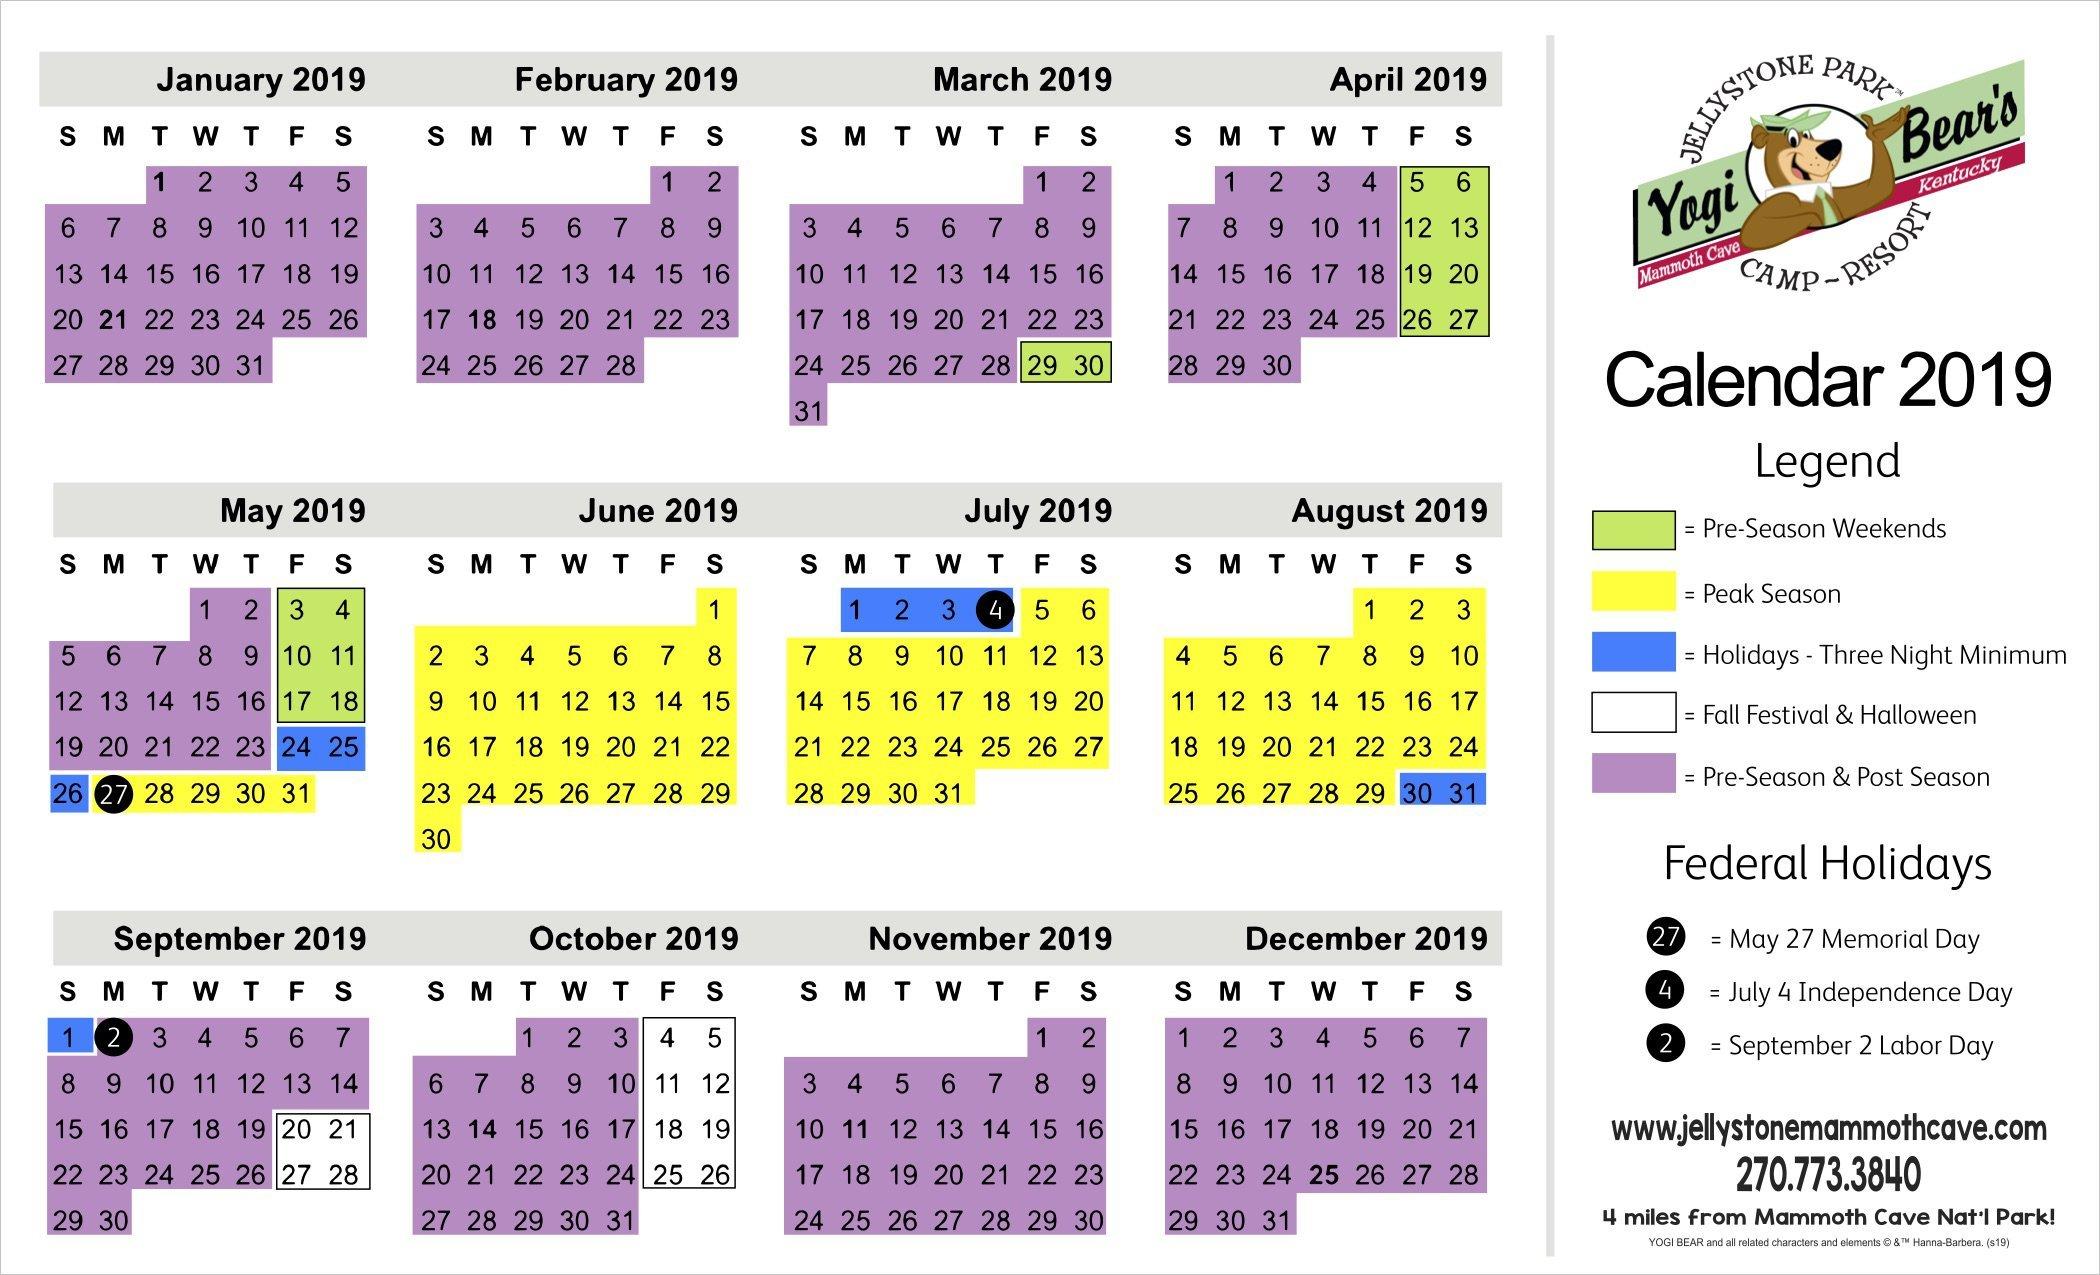 Rates – Jellystone Mammoth Cave Calendar 2019 Rates